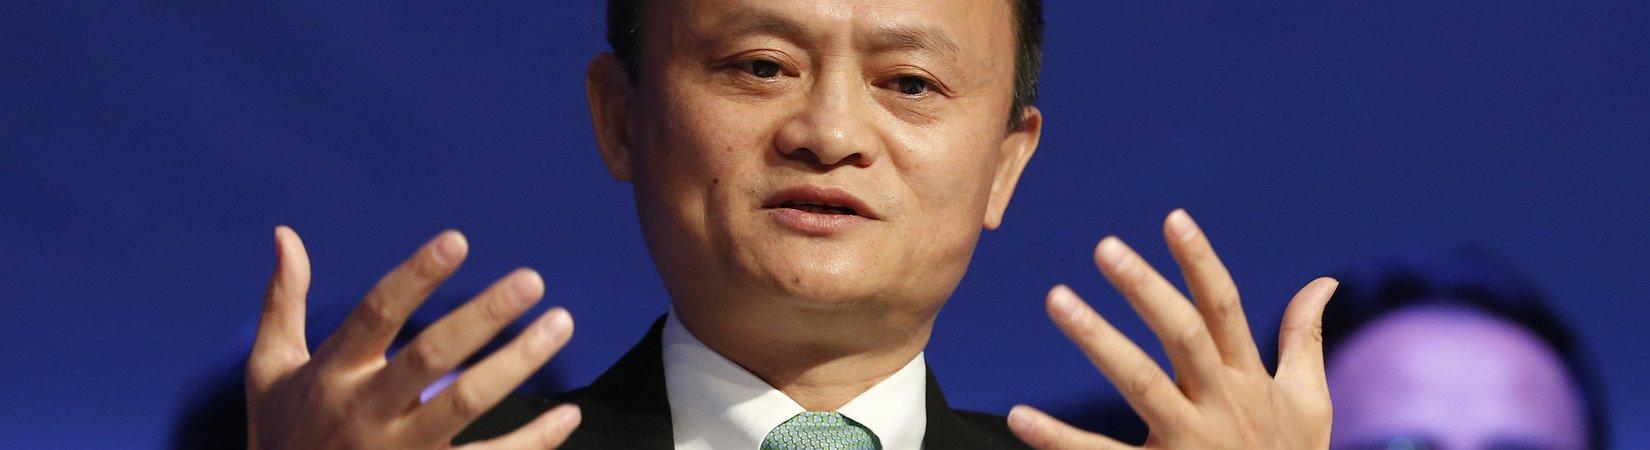 Alibaba misses earnings despite spike in revenue